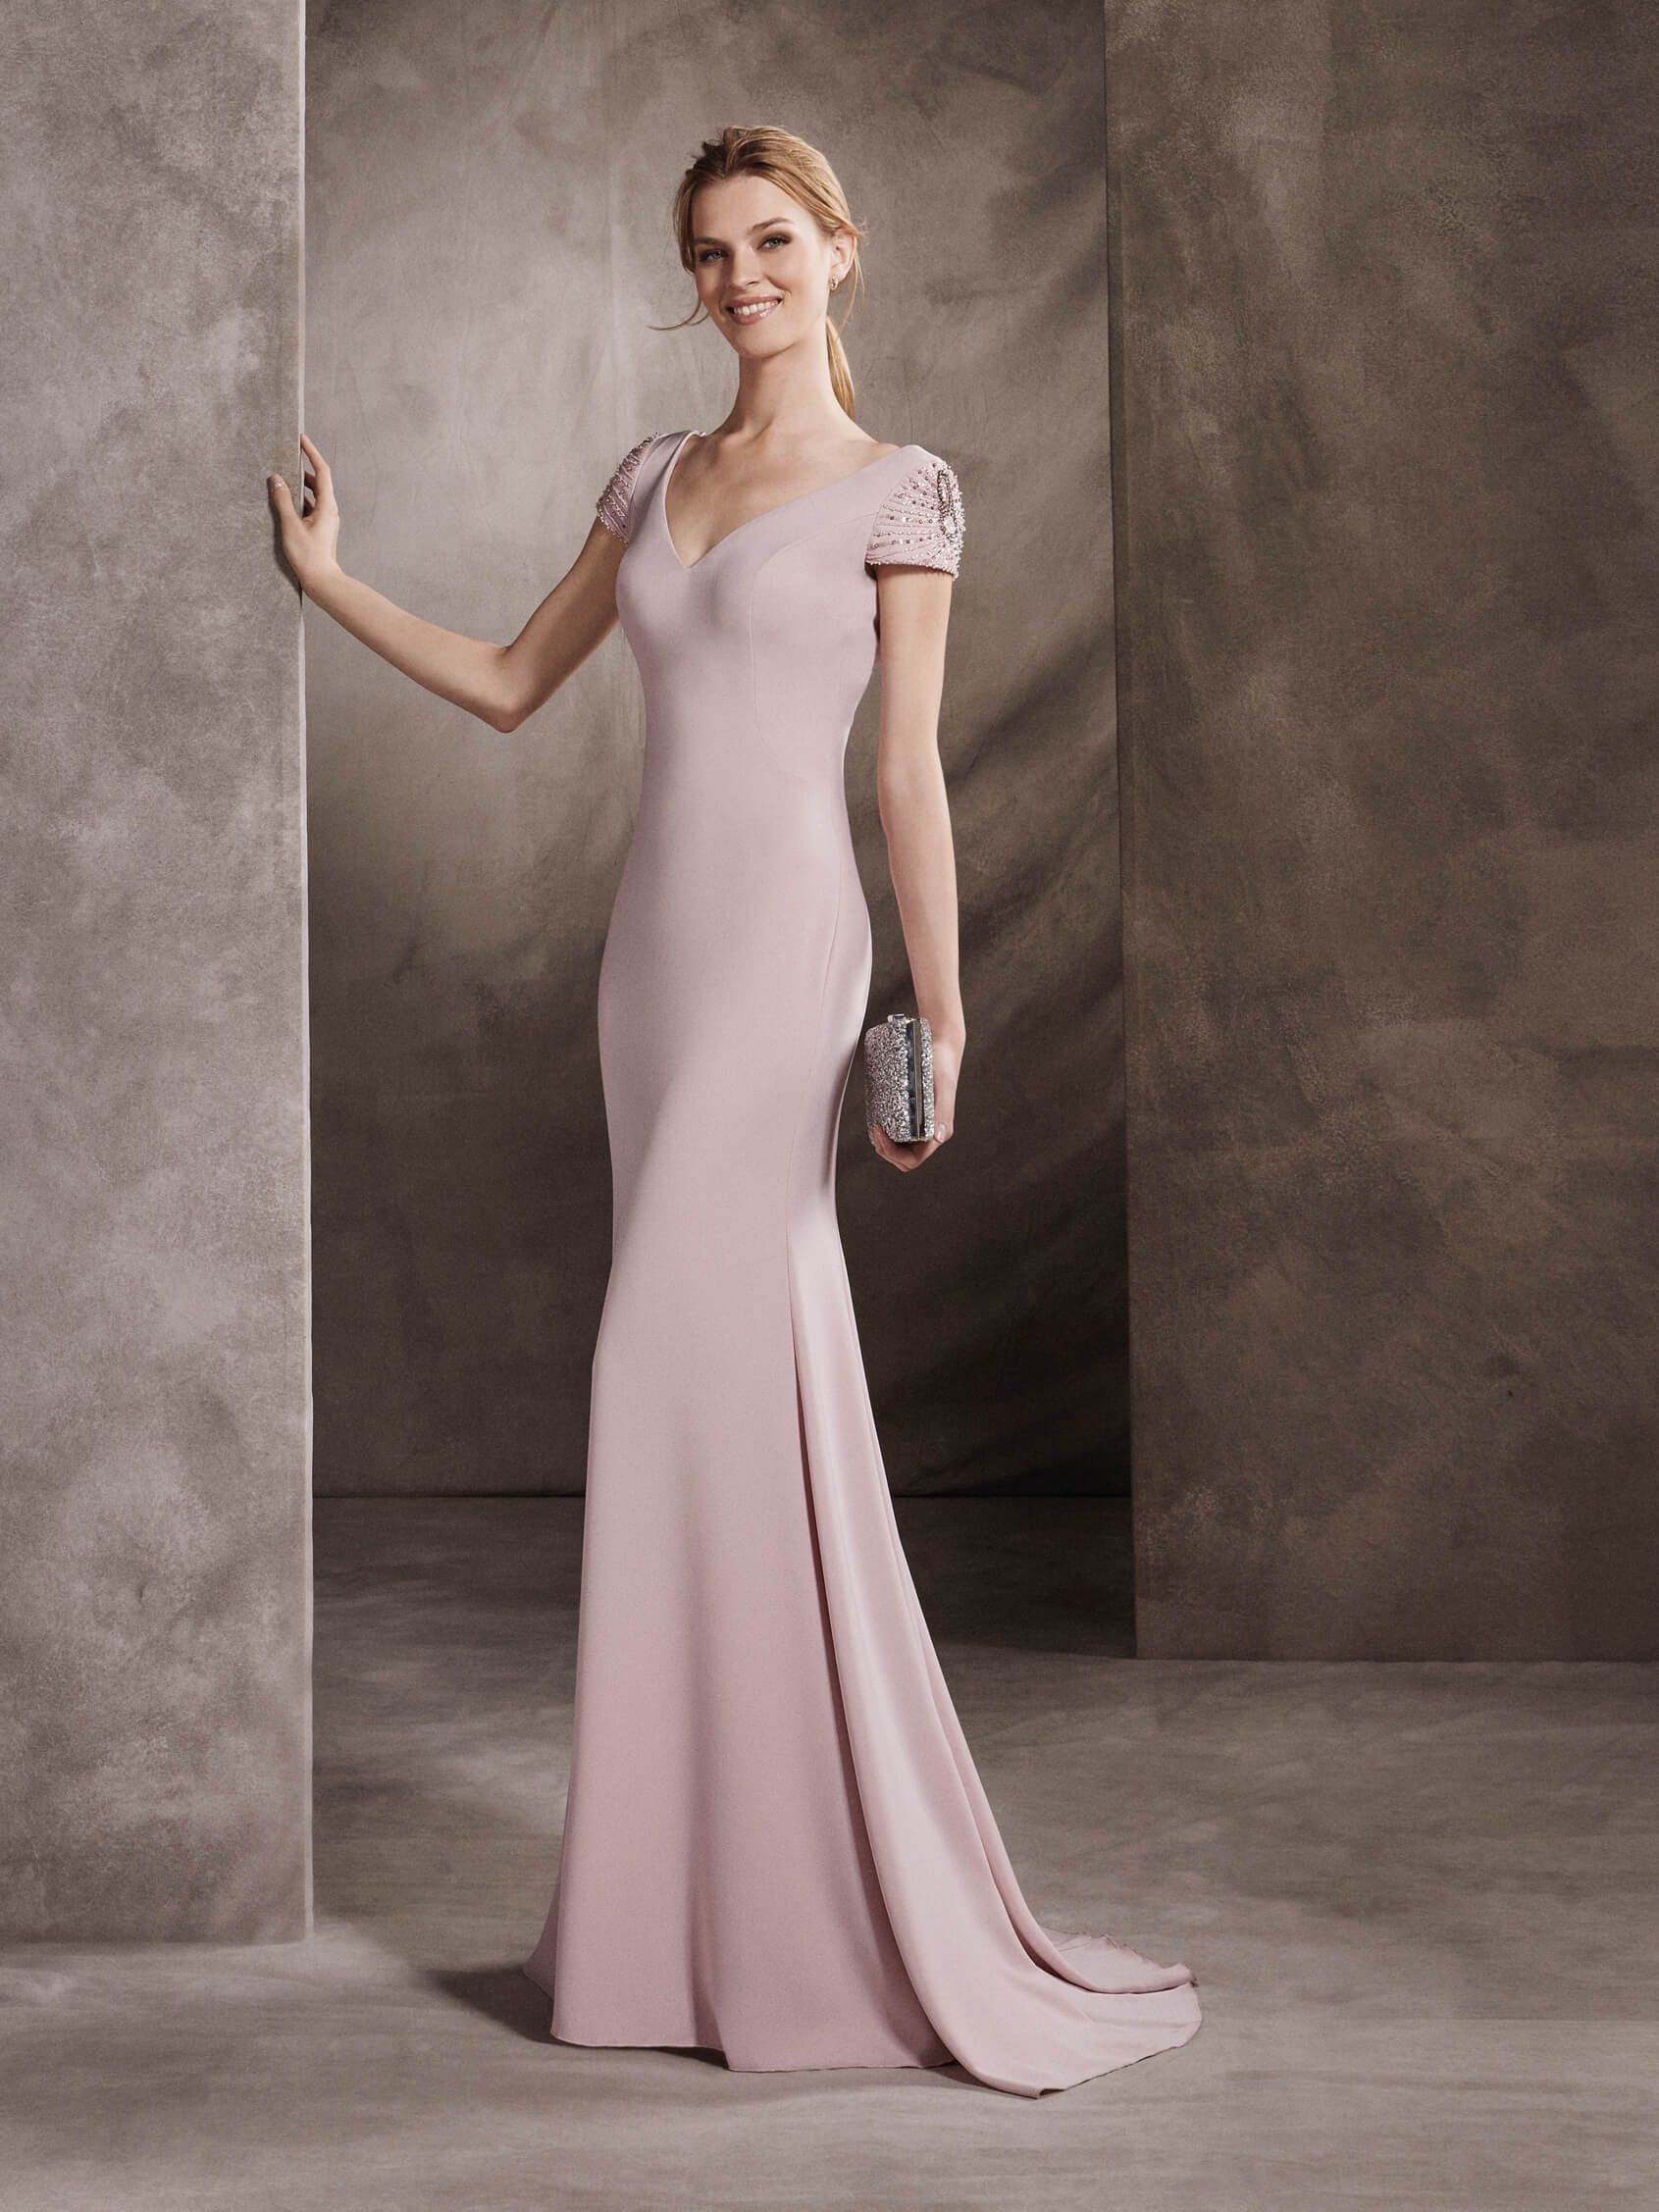 Vestido de Fiesta de St. Patrick (7200), largo | Dresses | Pinterest ...